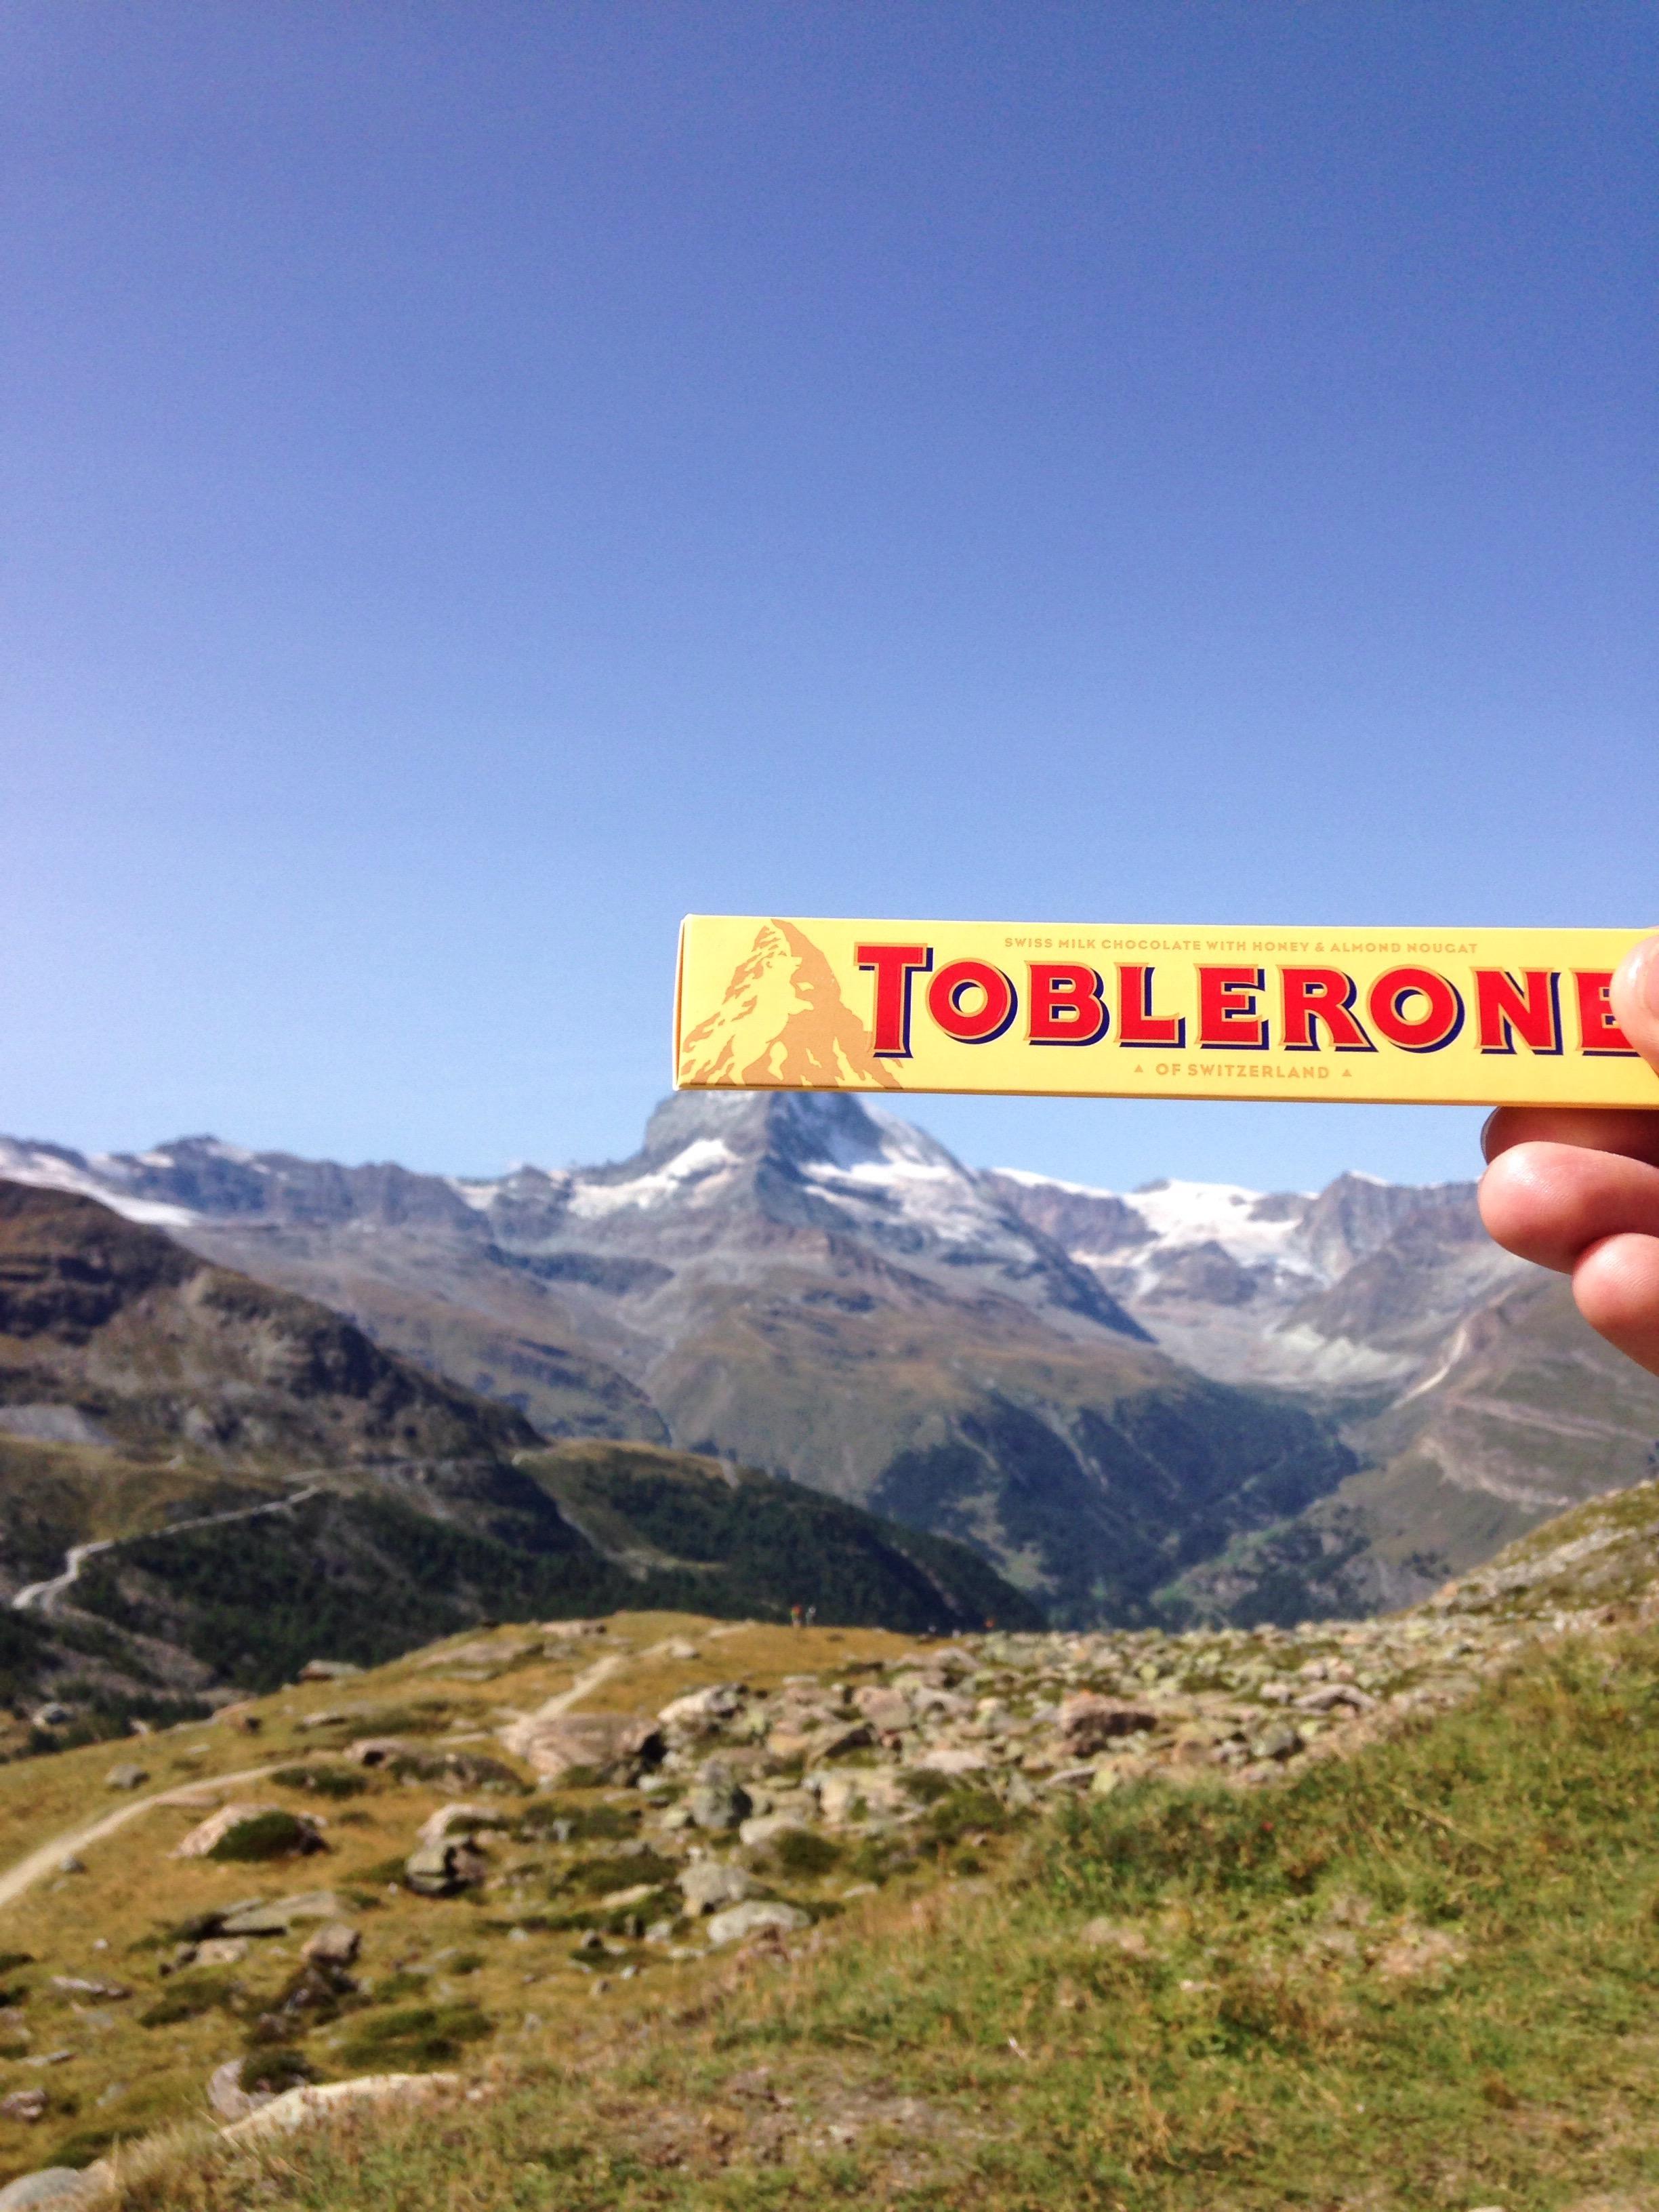 Toblerone at the Matterhorn